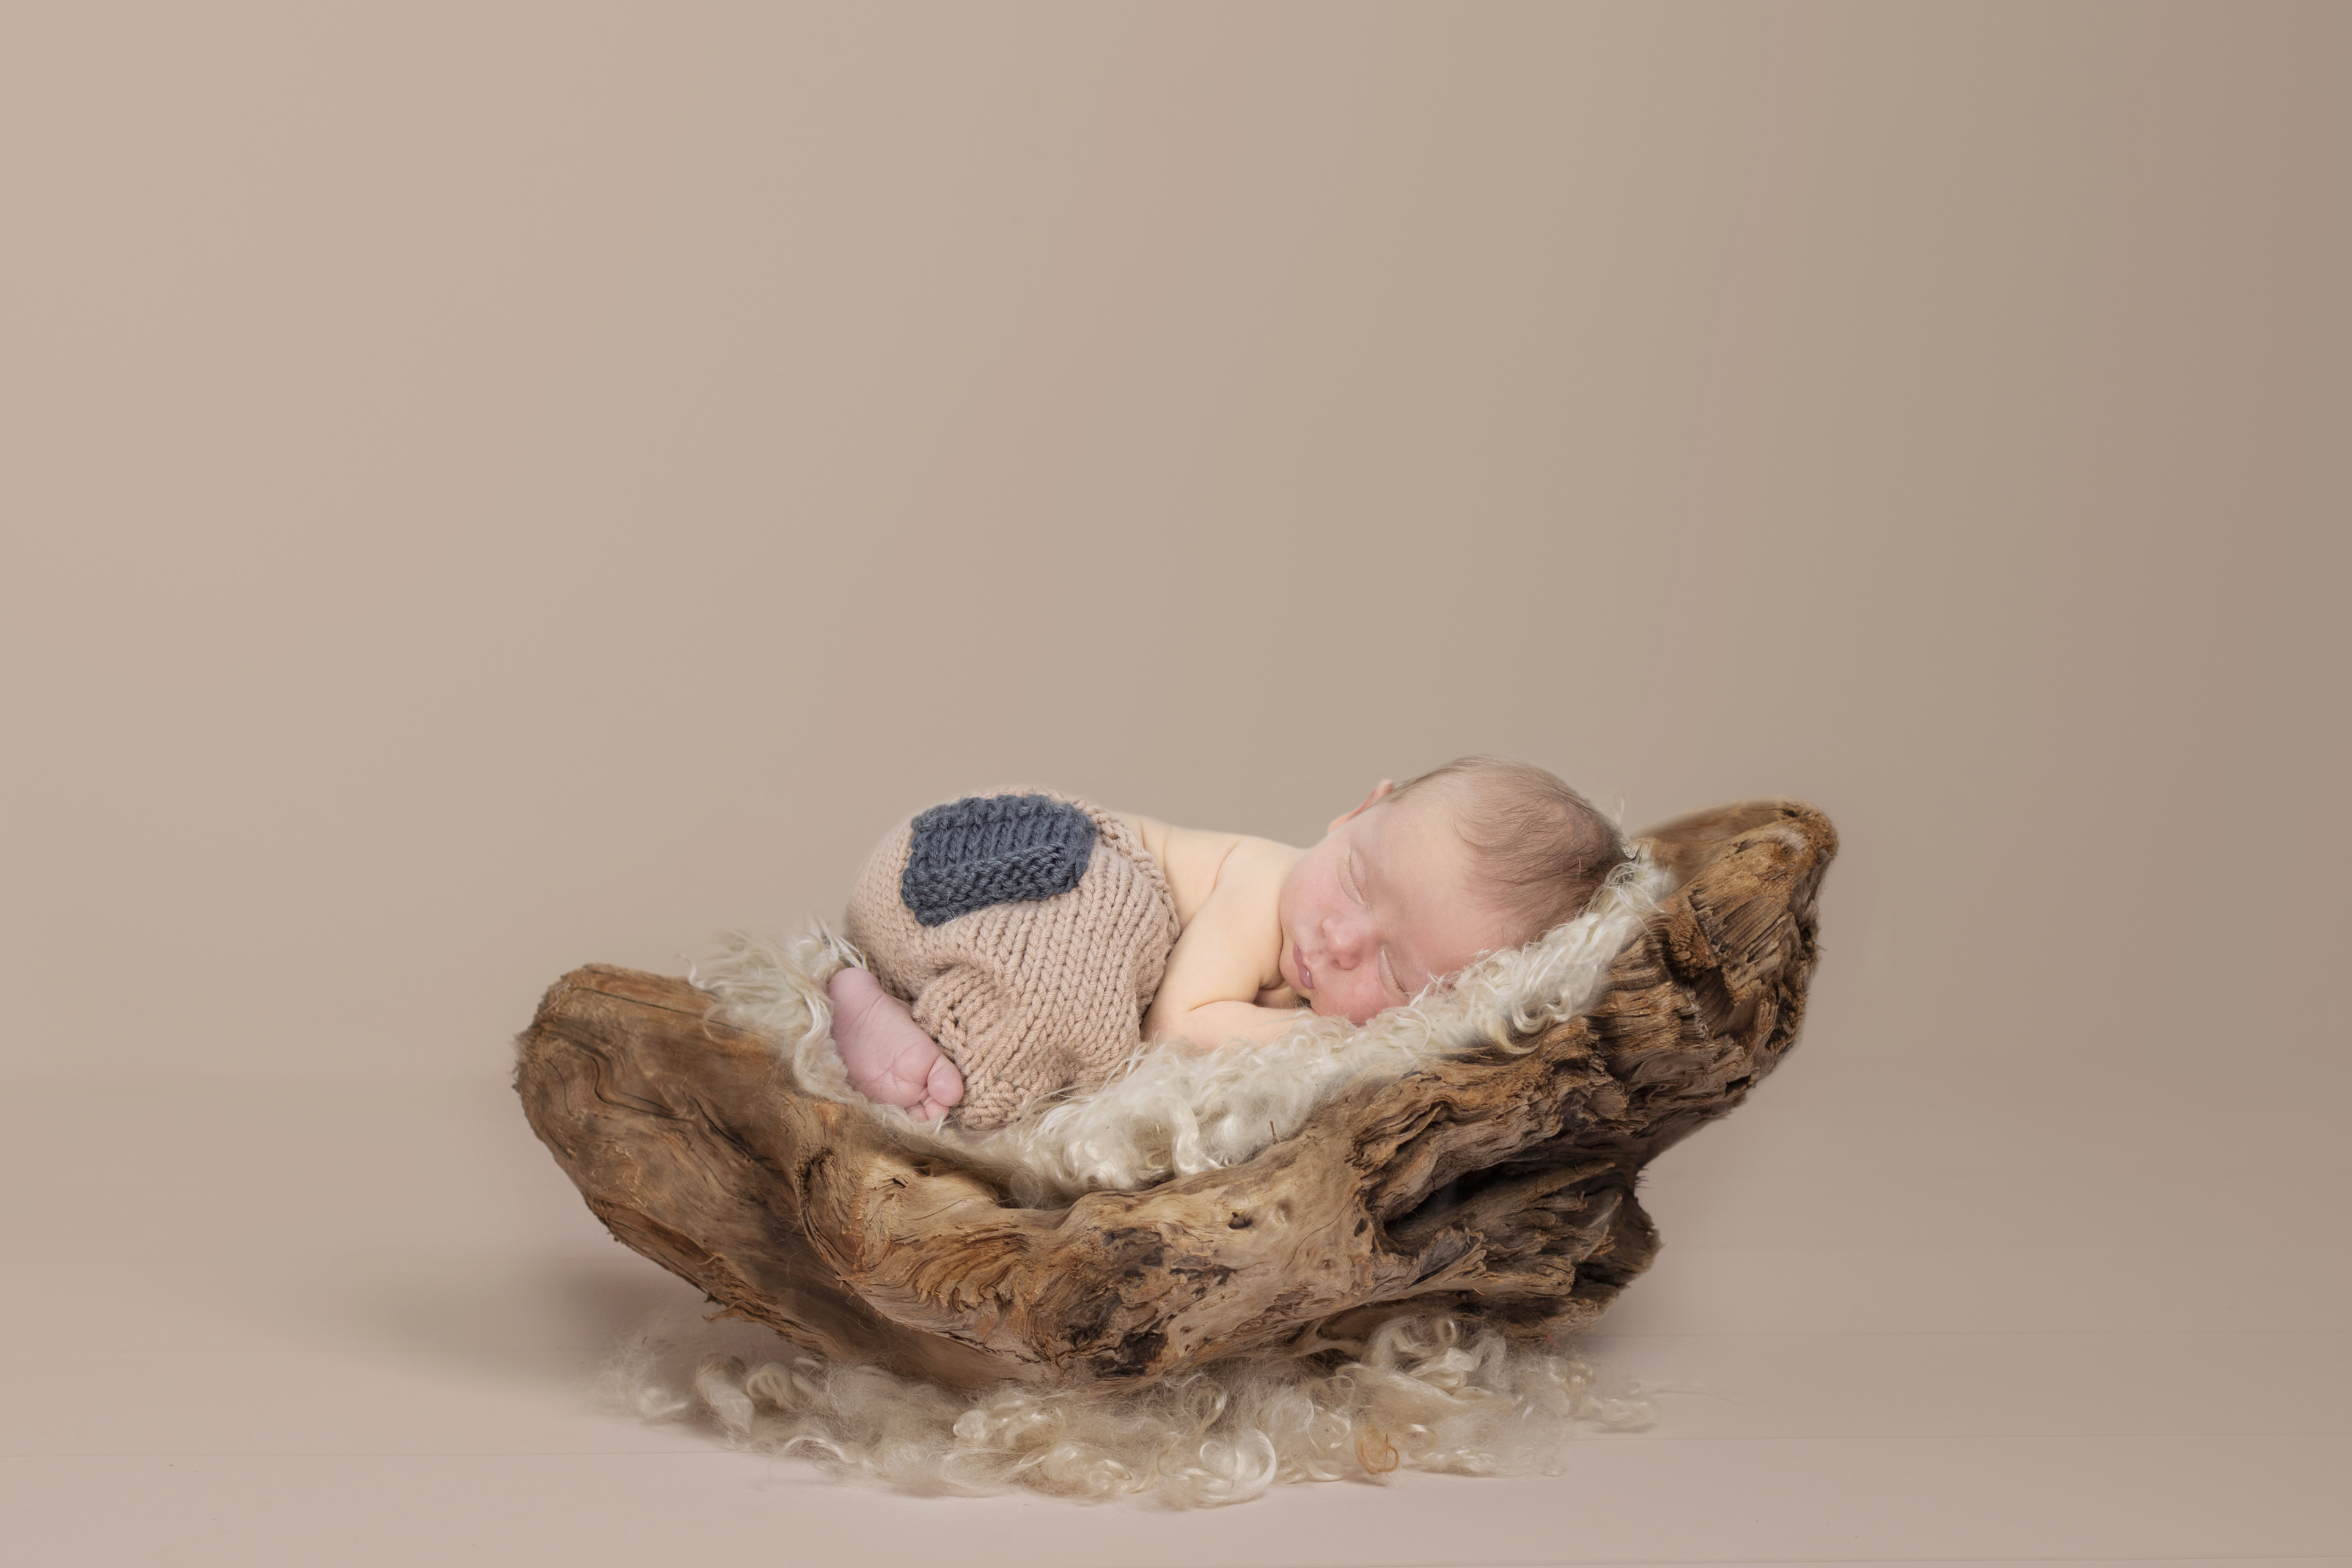 driftwood-on-cream-newborn-prop-download 2